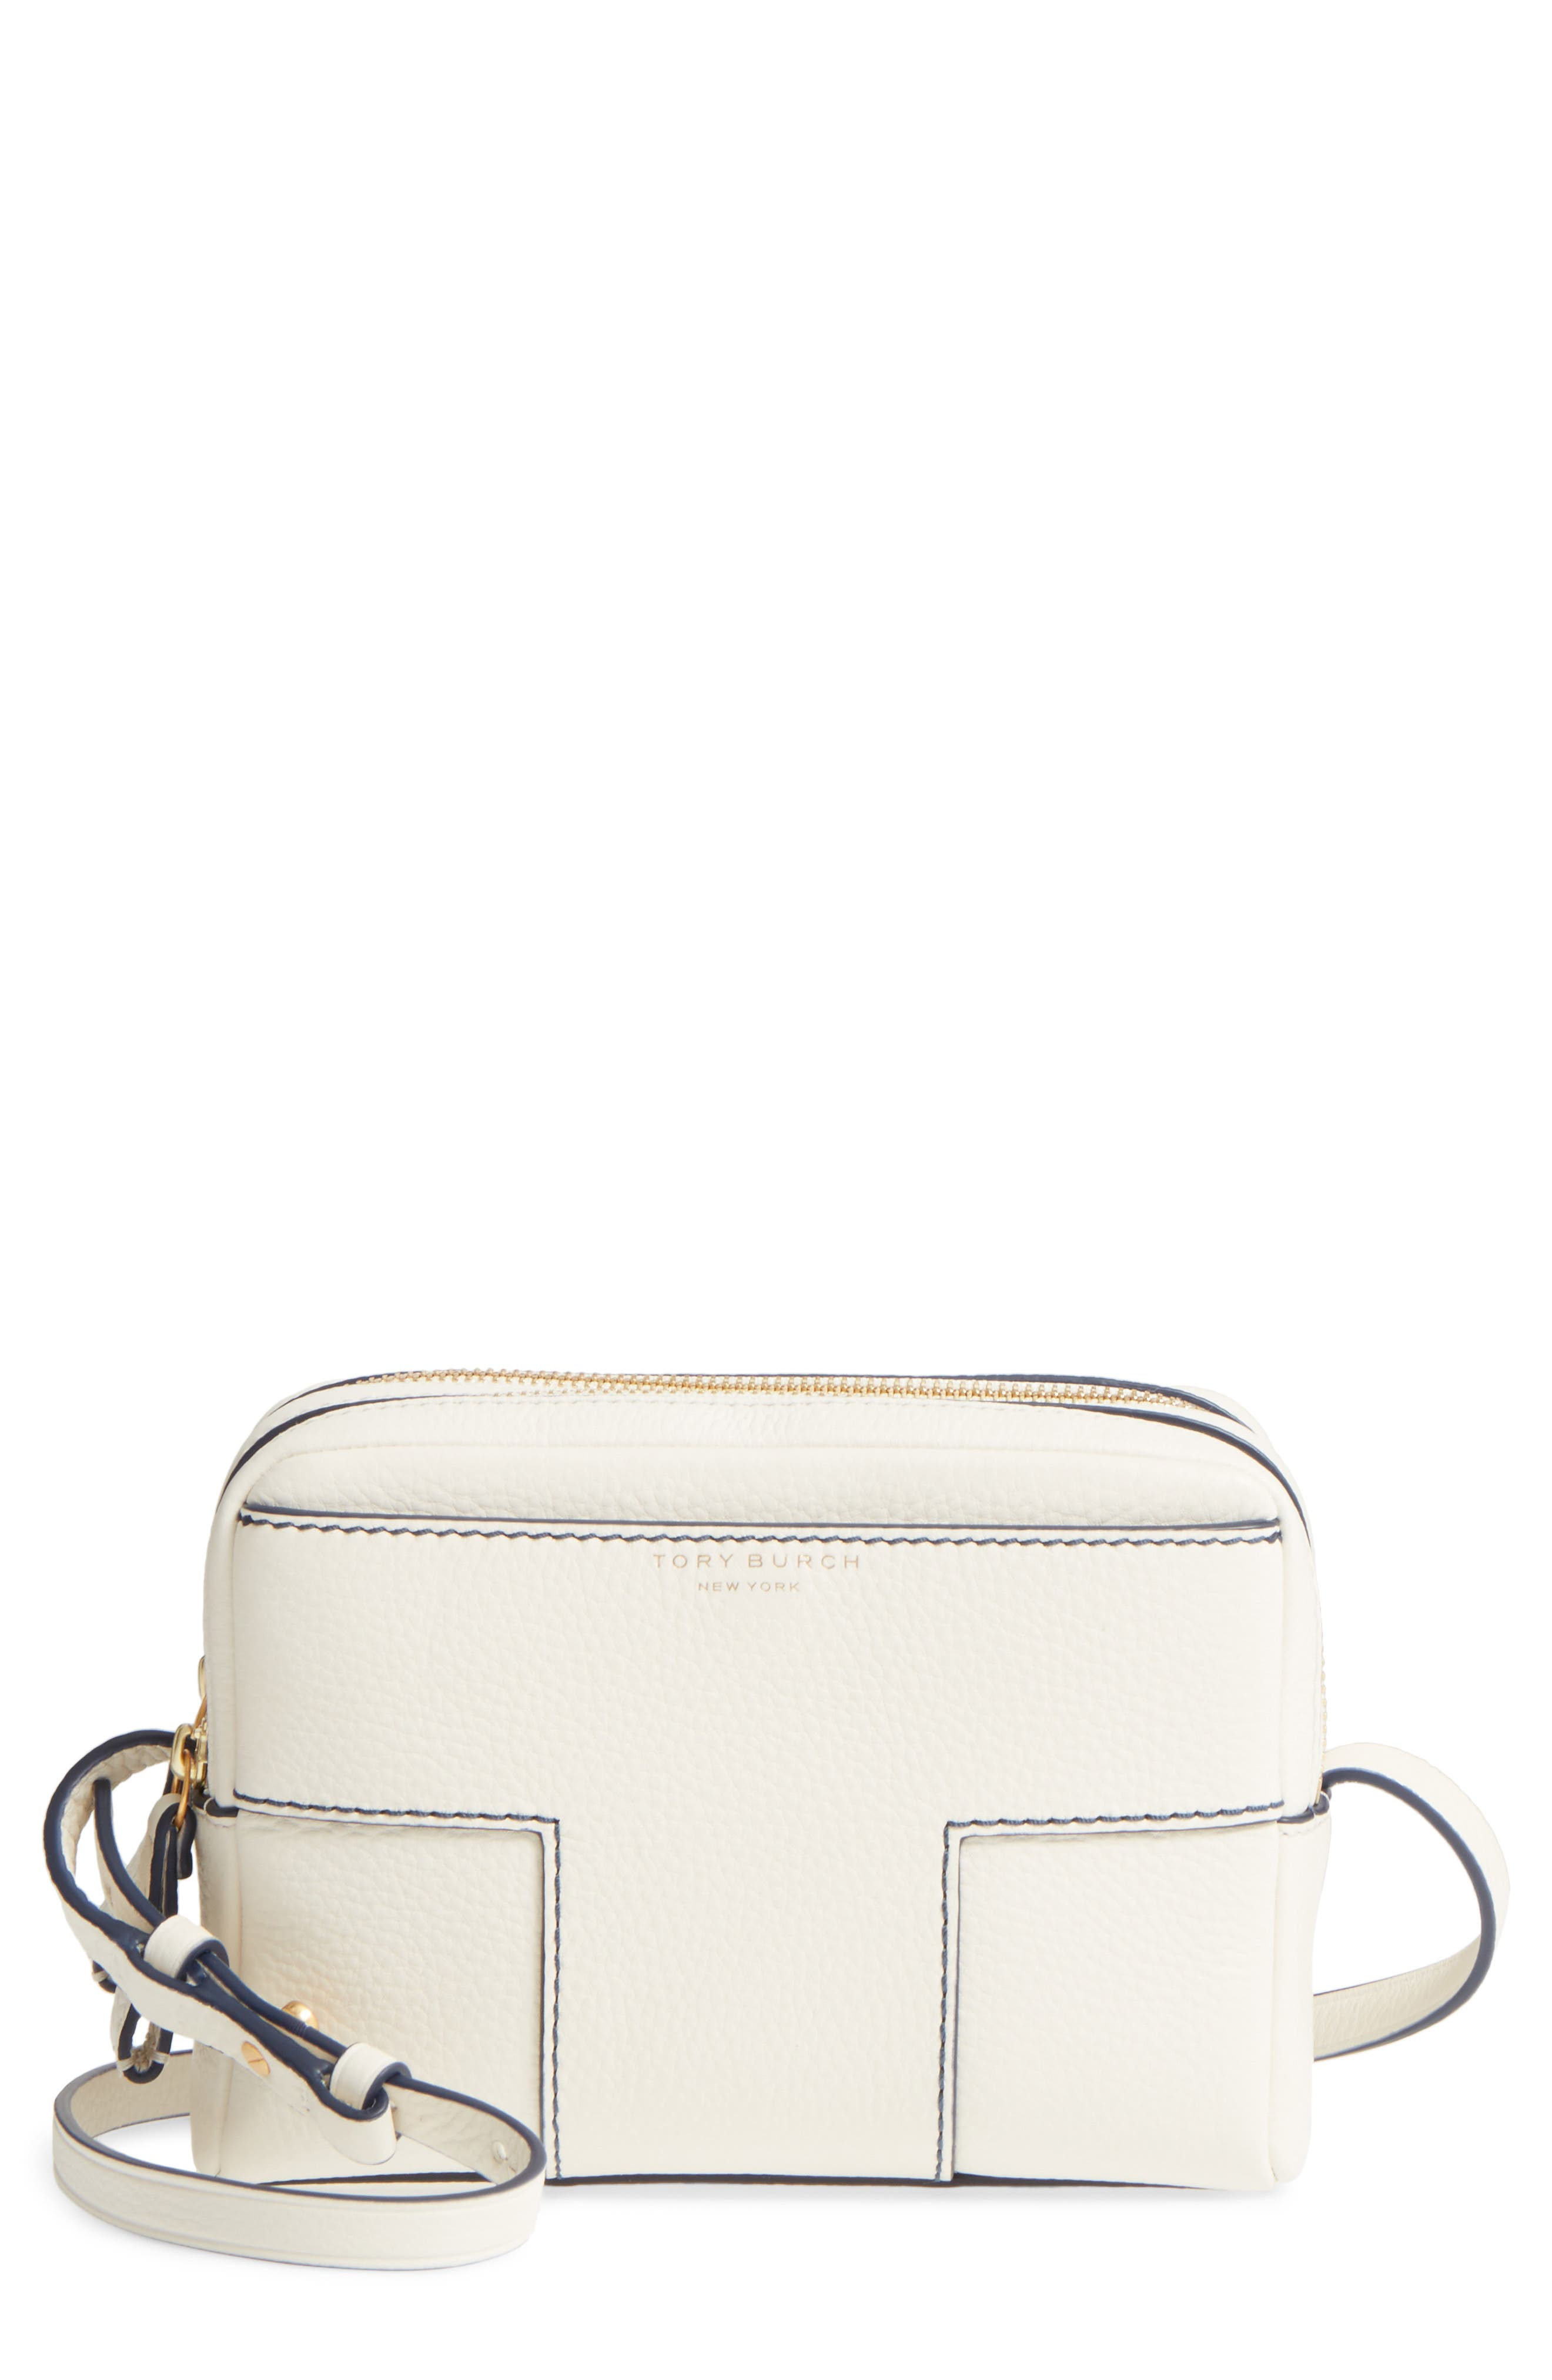 Block-T Double Zip Leather Crossbody Bag,                         Main,                         color, 100